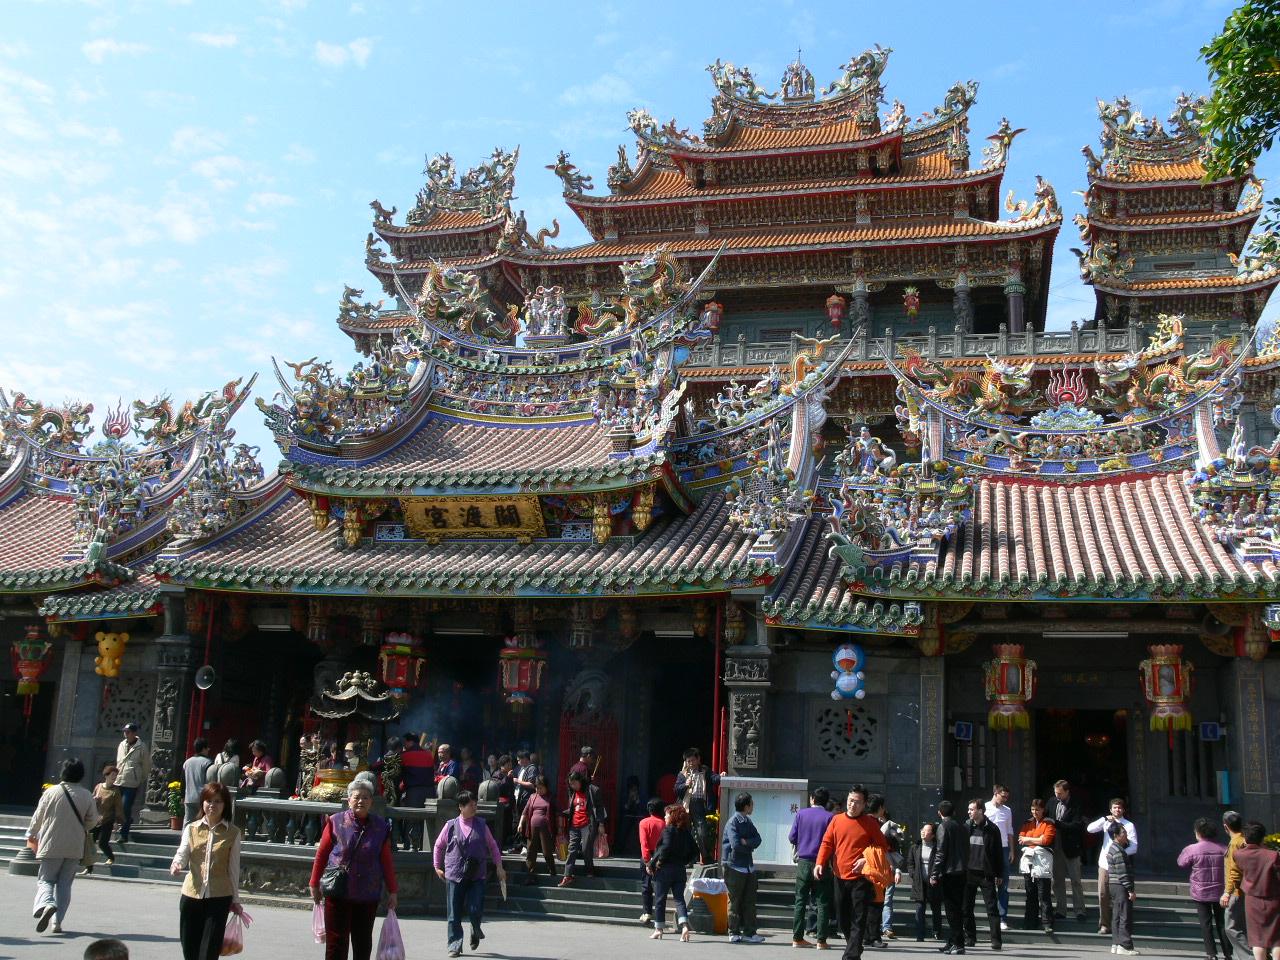 File:GuanDu temple-Taipei-Taiwan-P1010106.JPG